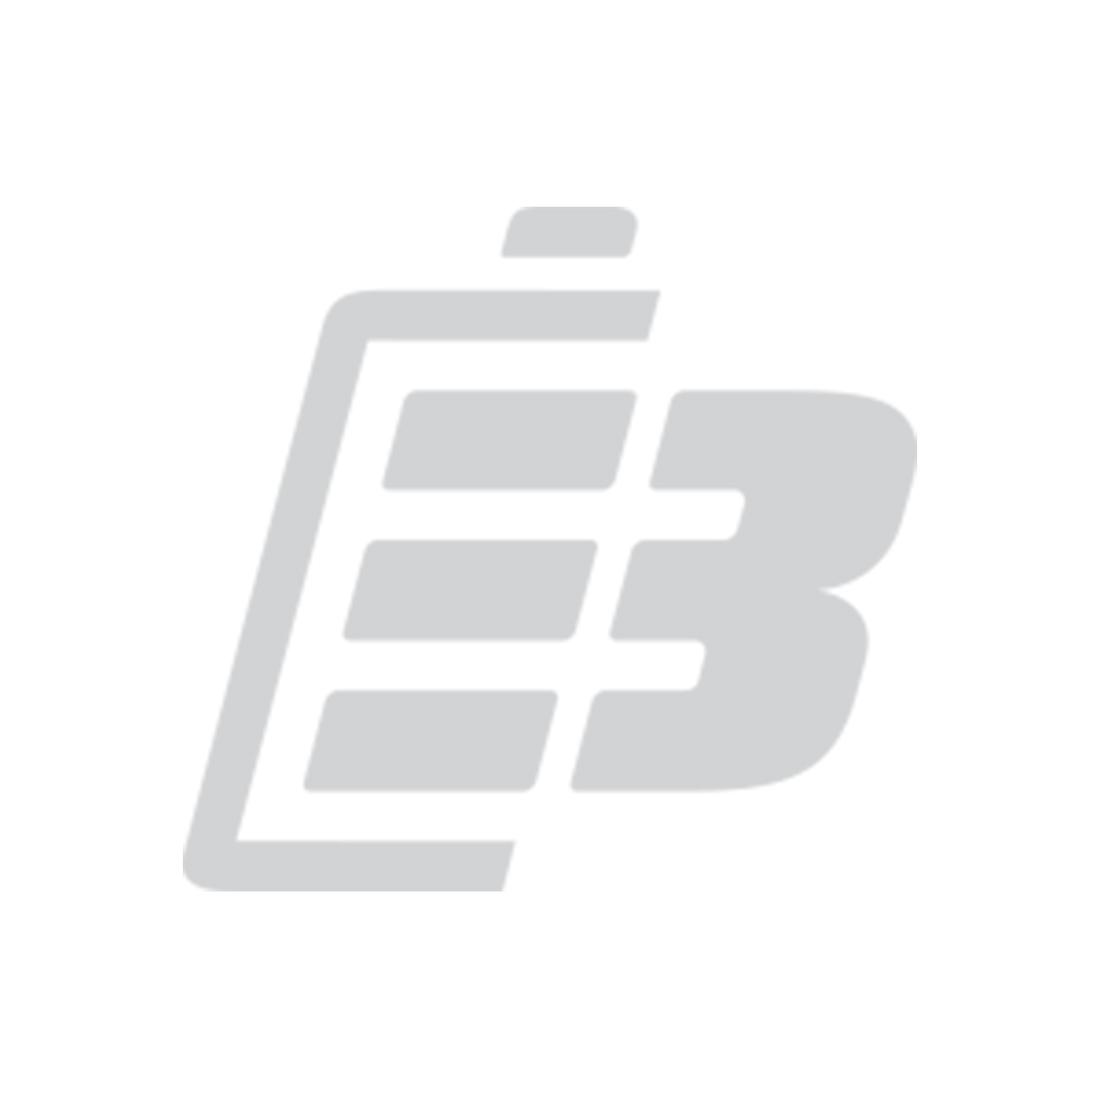 Duracell Industrial MN1604 D Alkaline battery 9V 1